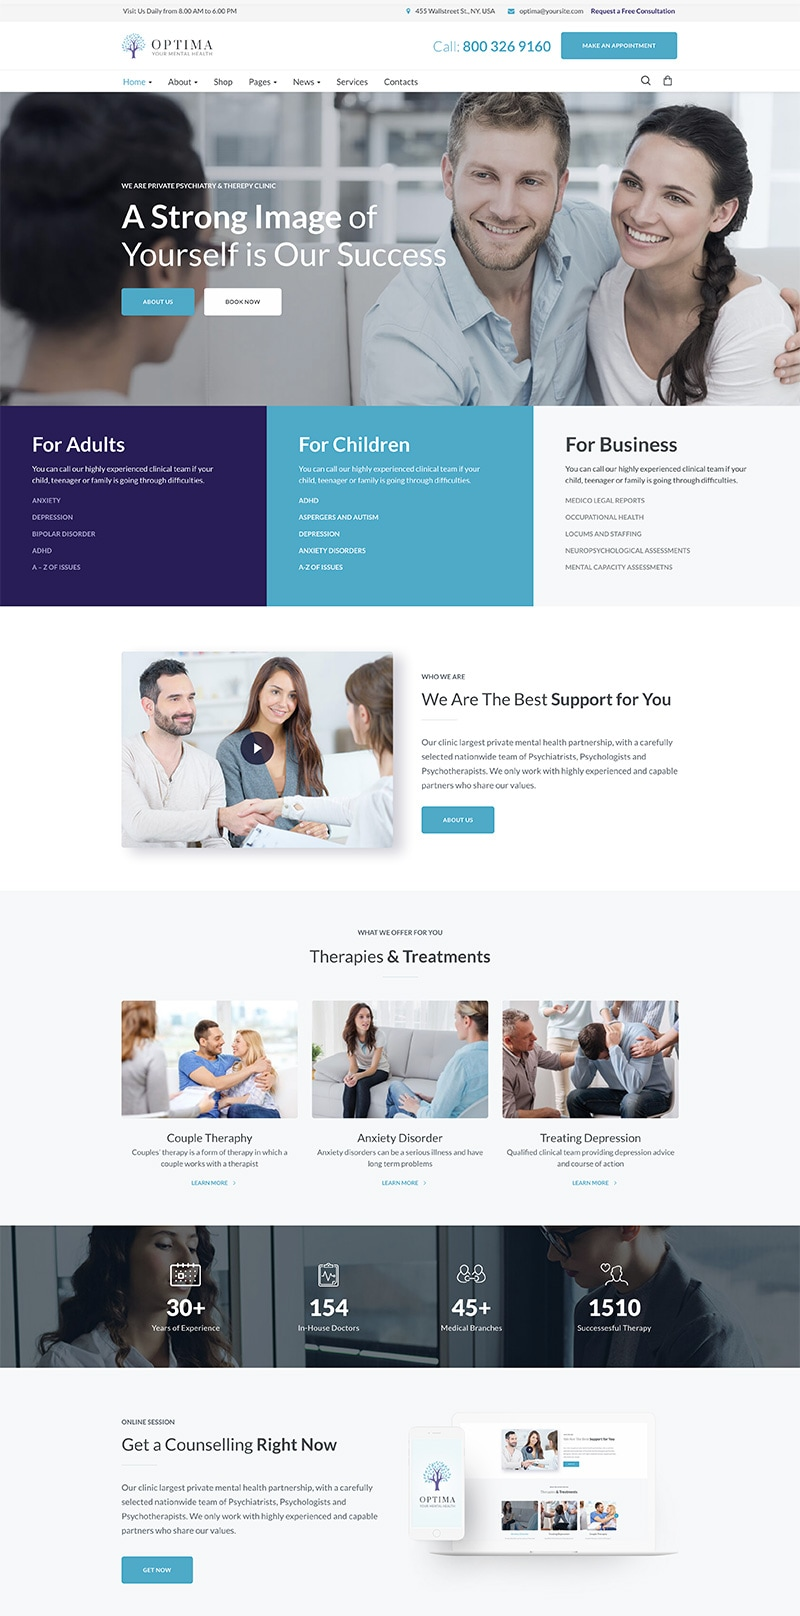 Optima - Psychologist & Psychology Center WordPress Theme